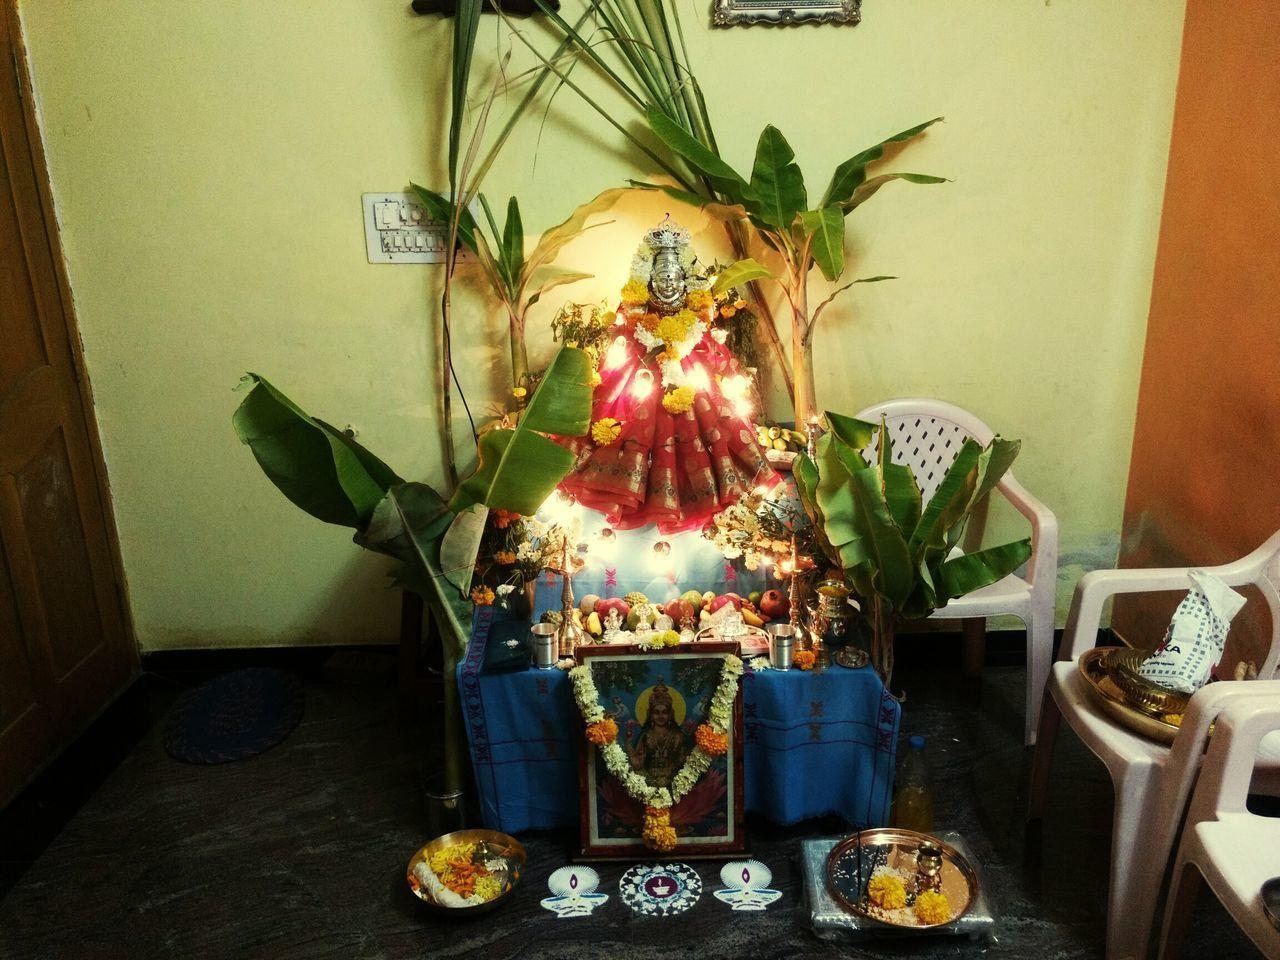 Indoors  No People Neon Lights Smartphone Photography Diwali Celebrations Moto G4 Plus Multi Colored Diwali💟🎇🎆🌌 Lord Lakshmi Lakshmipoojan Indoors  Banana Leaves Sugarcane Light Decorations Urban 1 Filter Low Light Photography